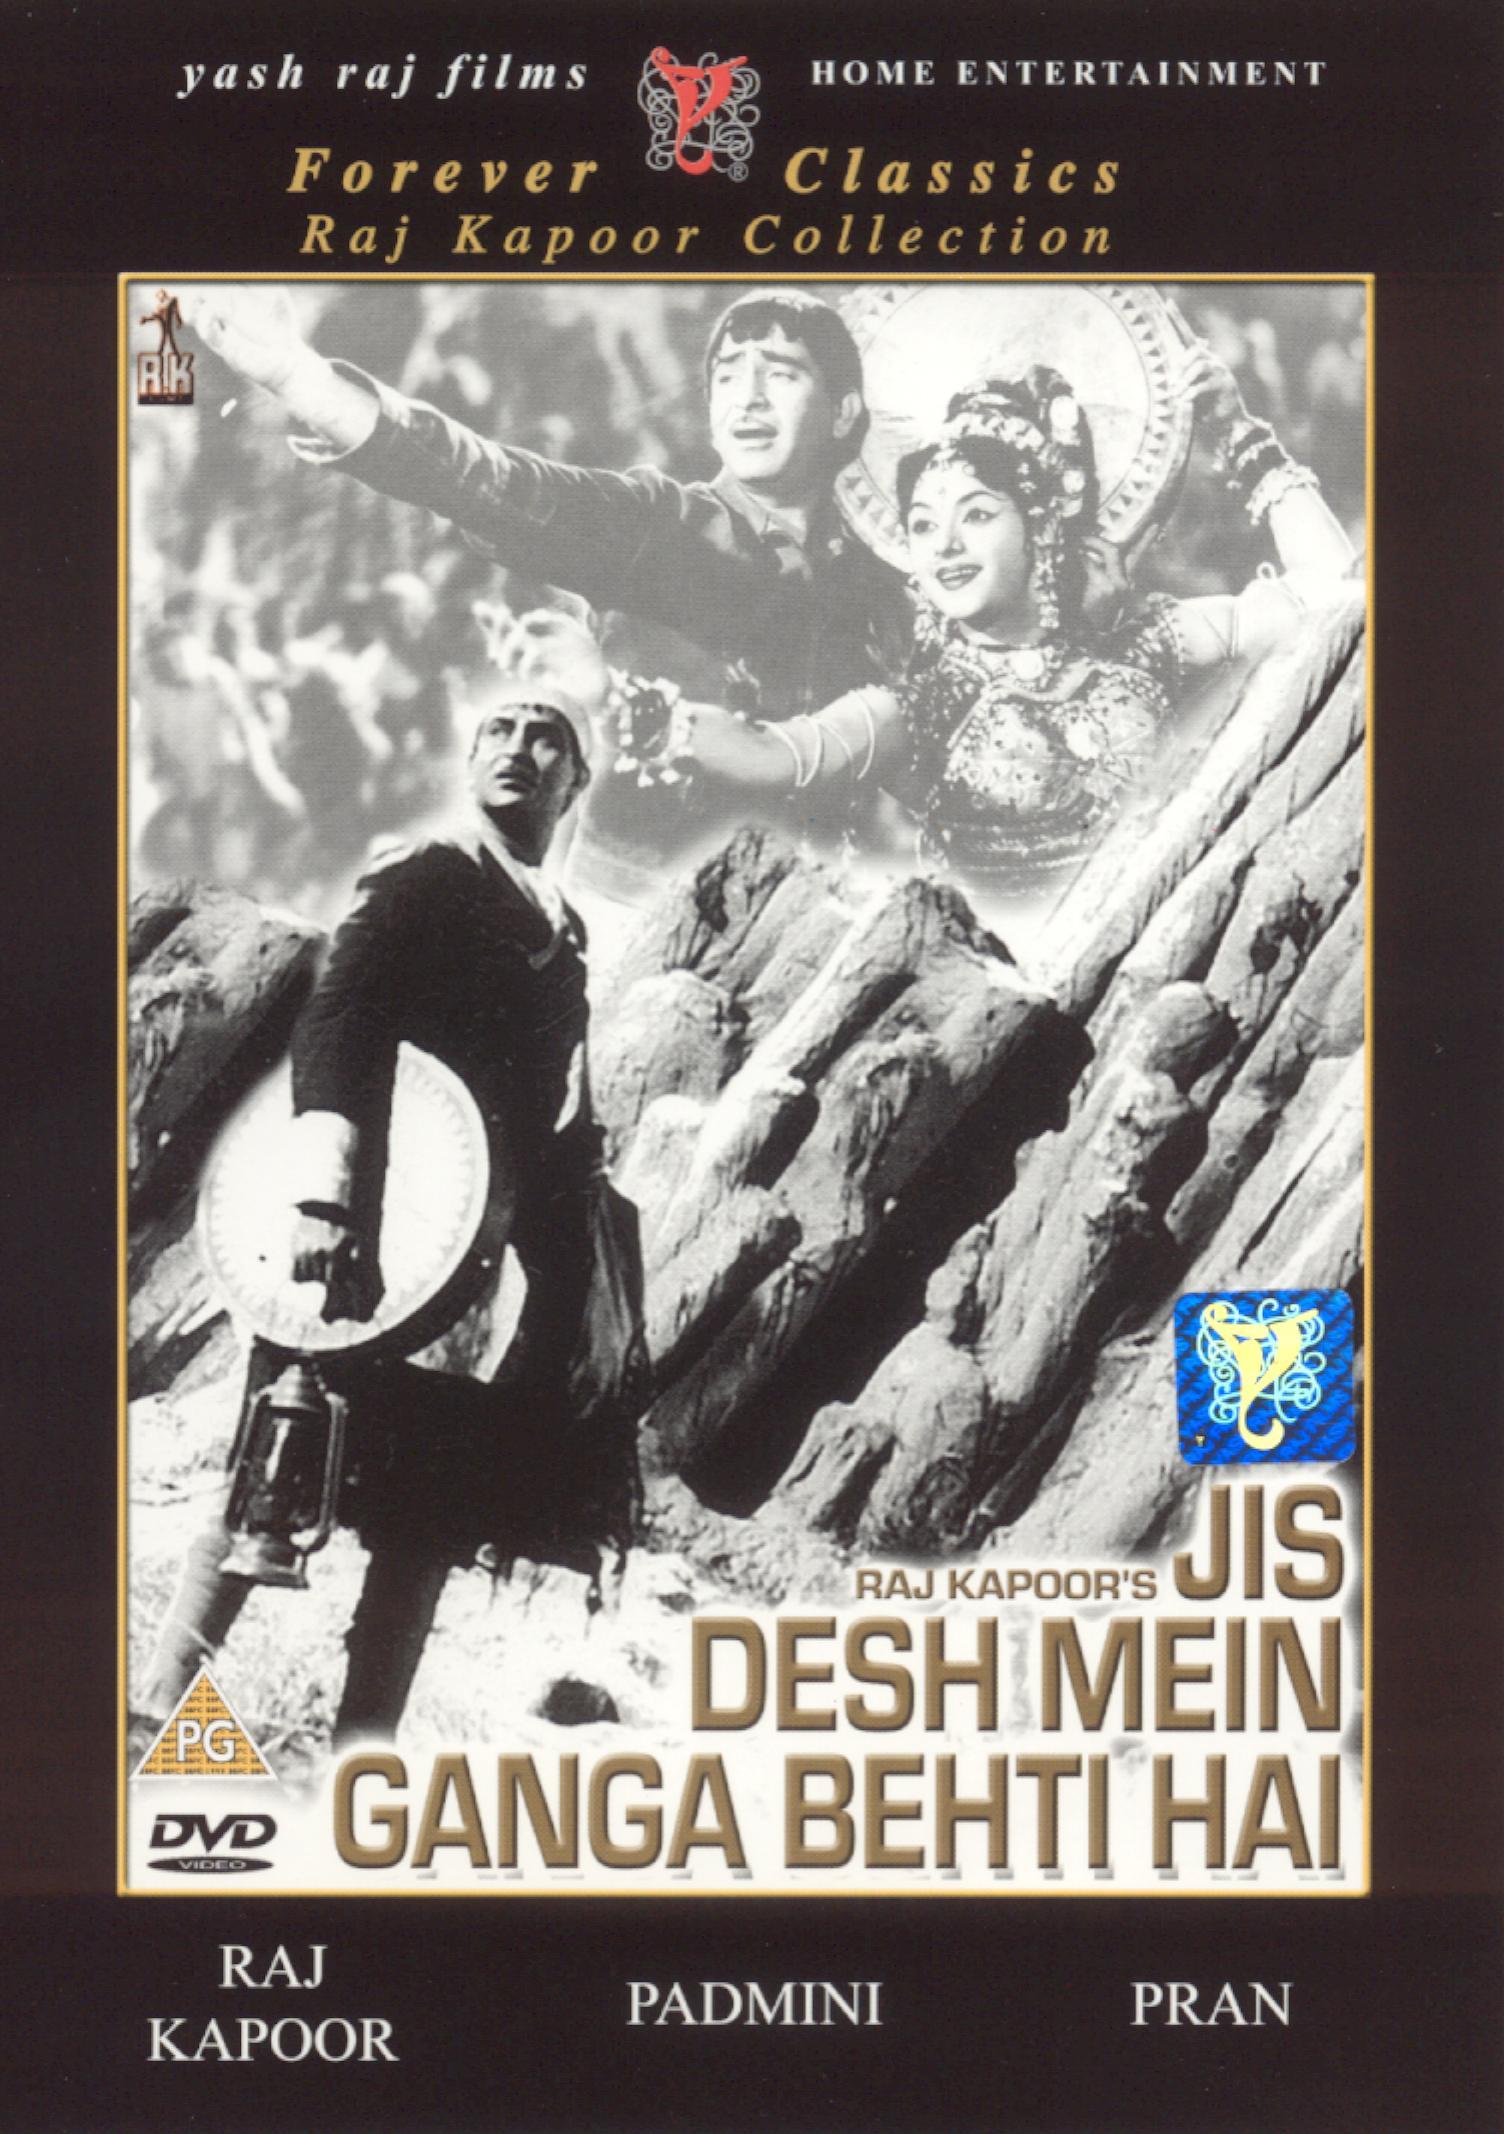 Jis Desh Mein Ganga Behti Hai